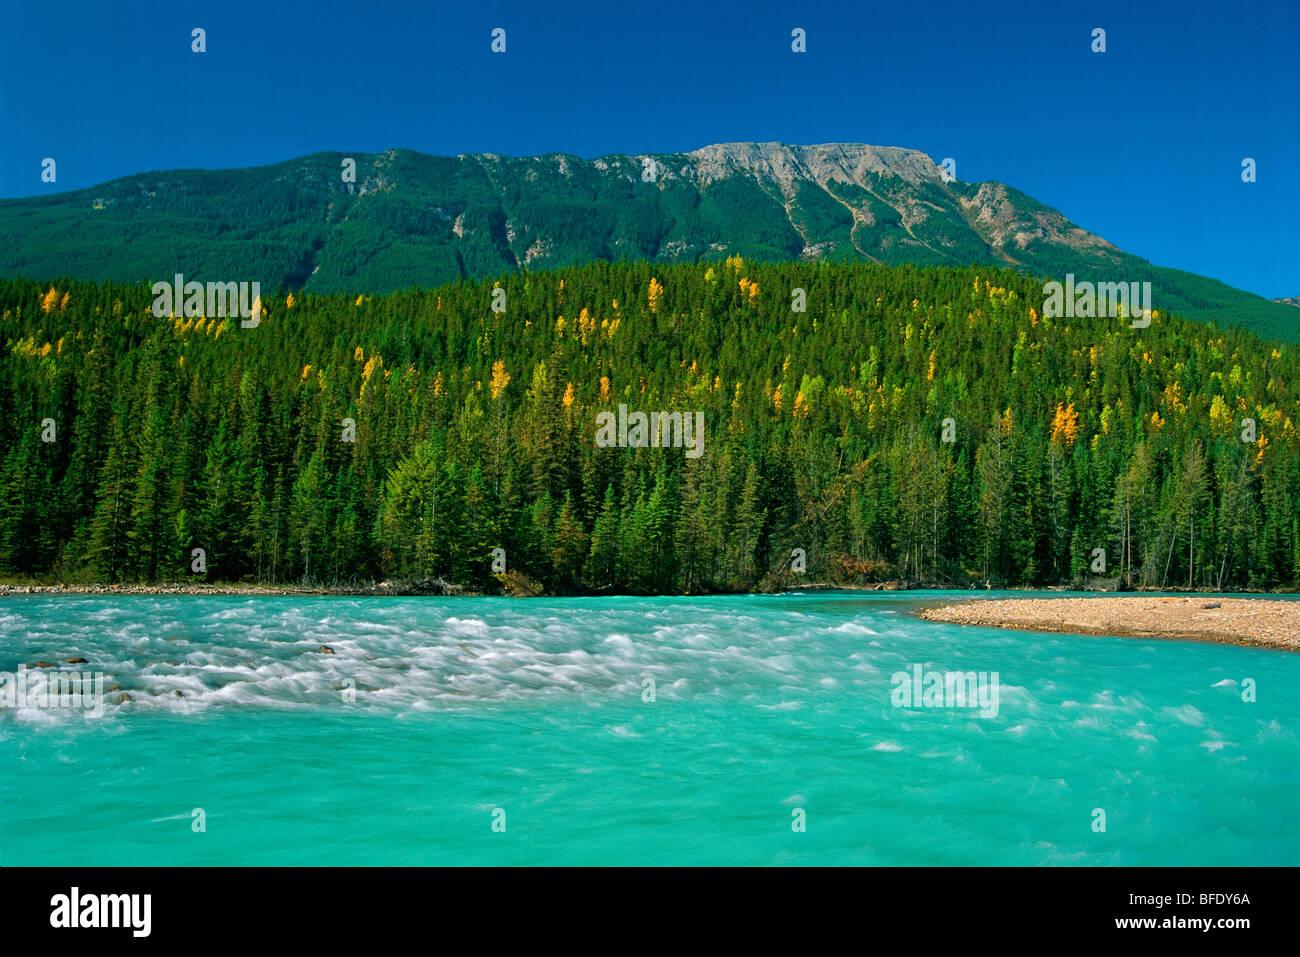 Kicking Horse River, Yoho National Park, British Columbia, Canada - Stock Image